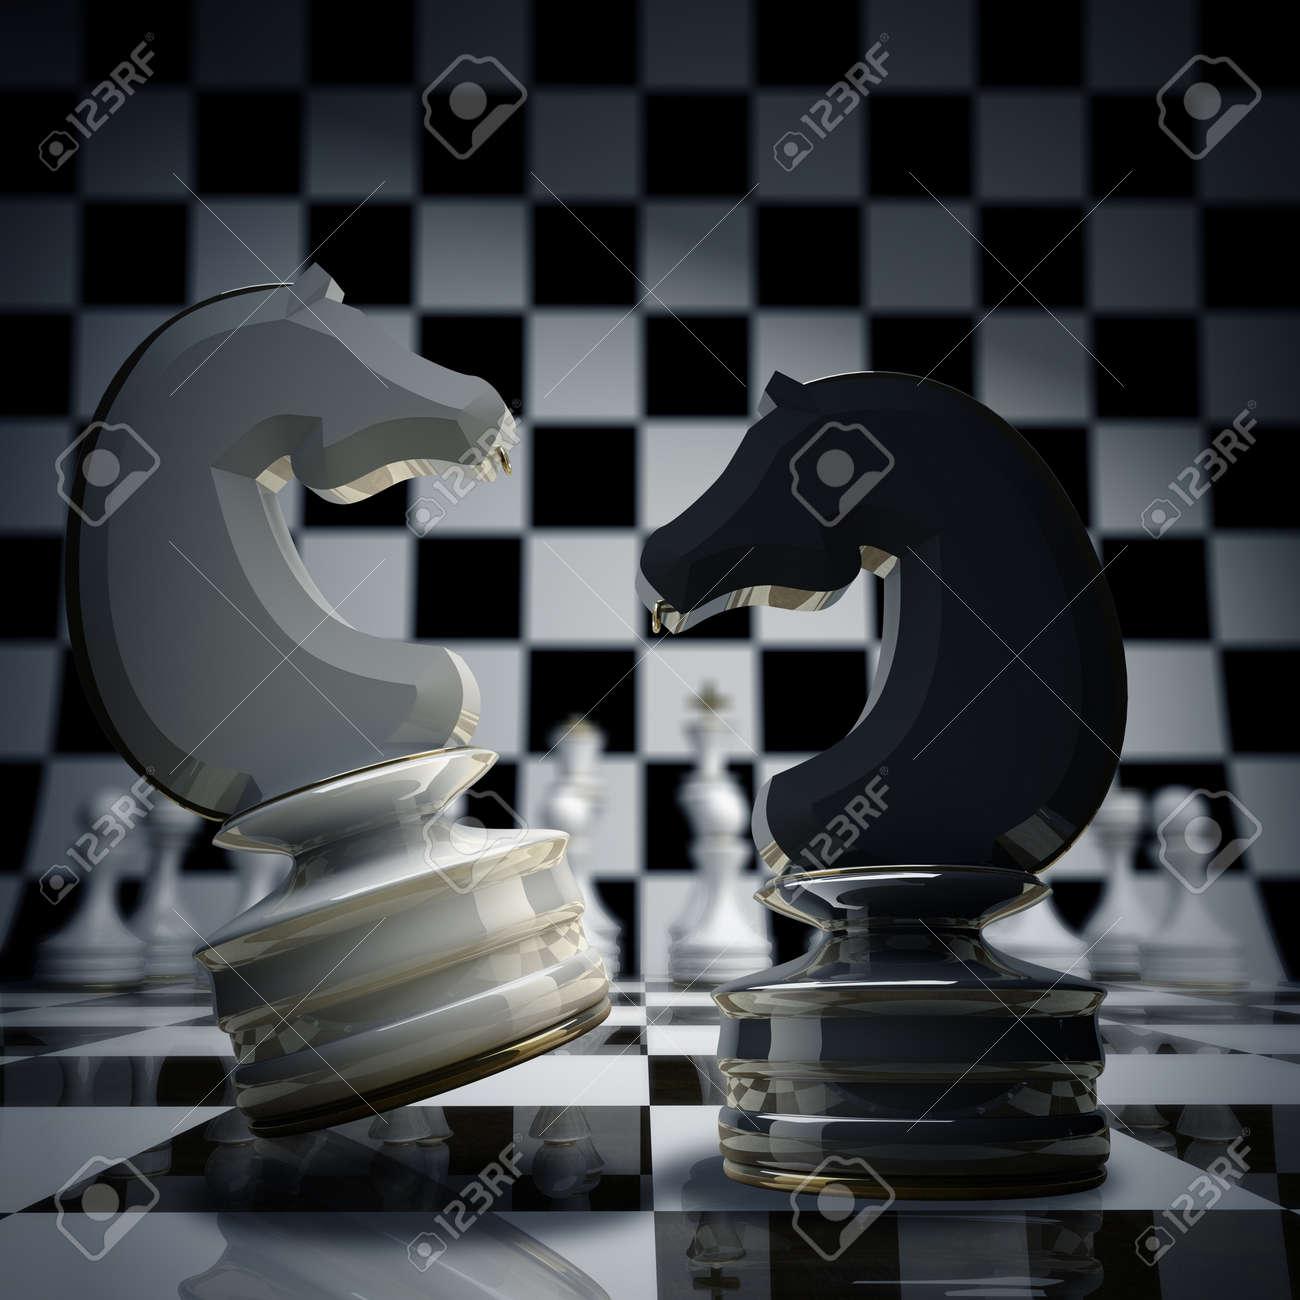 Black vs wihte chess horse background 3d illustration. high resolution Stock Illustration - 18720070